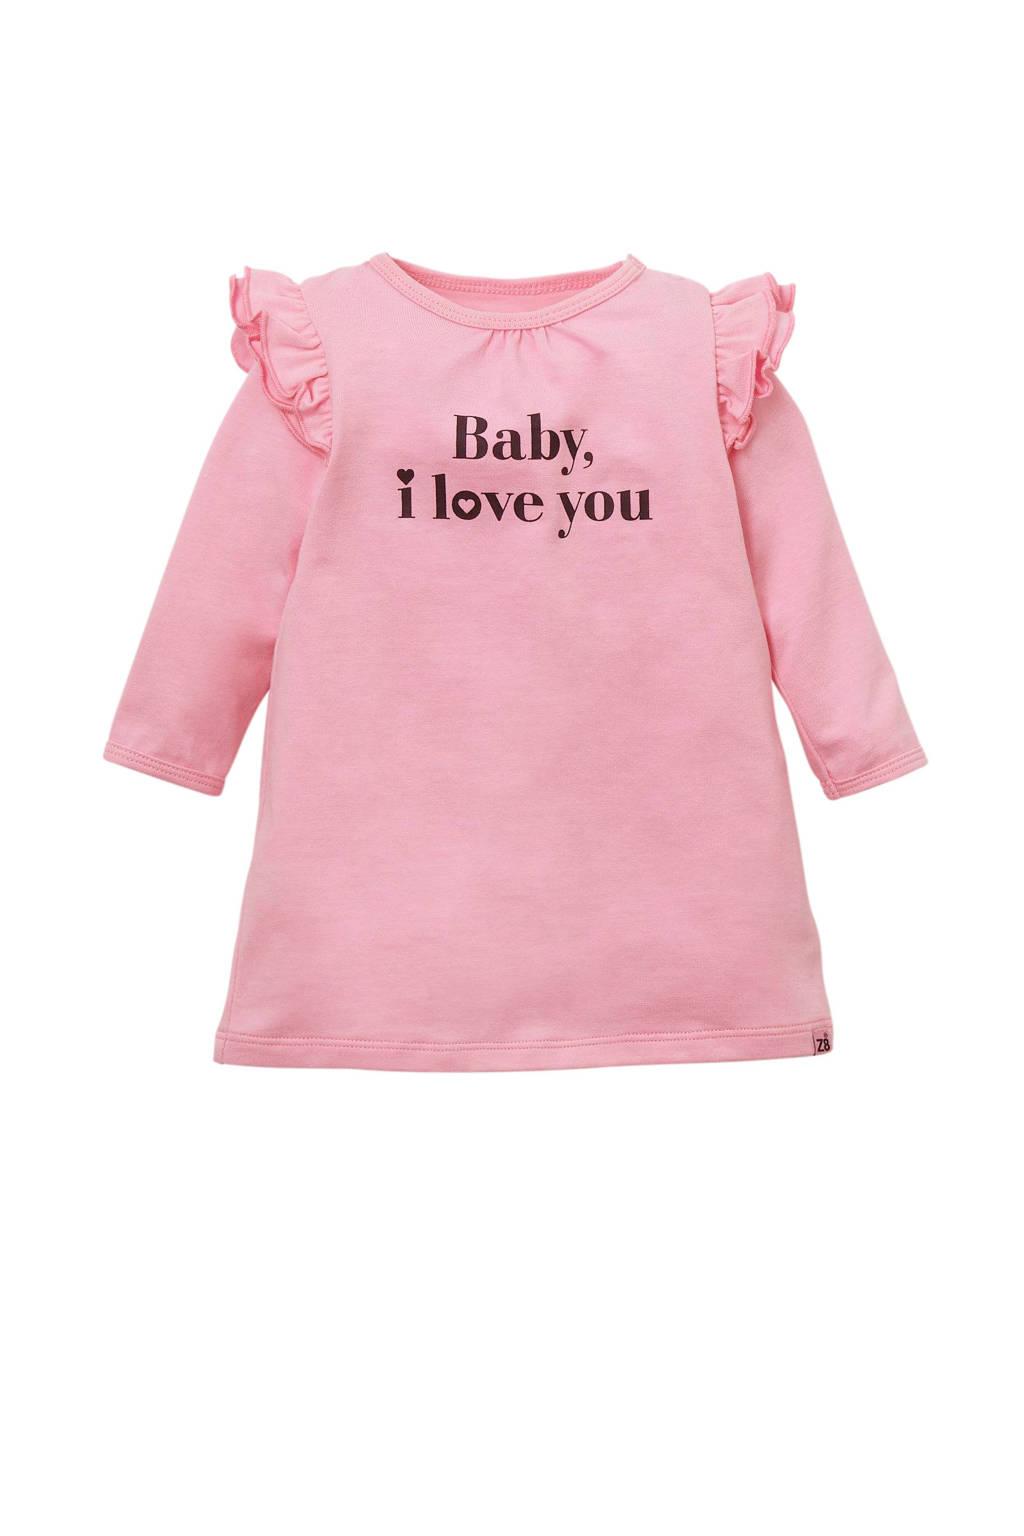 Z8 newborn baby jurk Phoebe, Roze